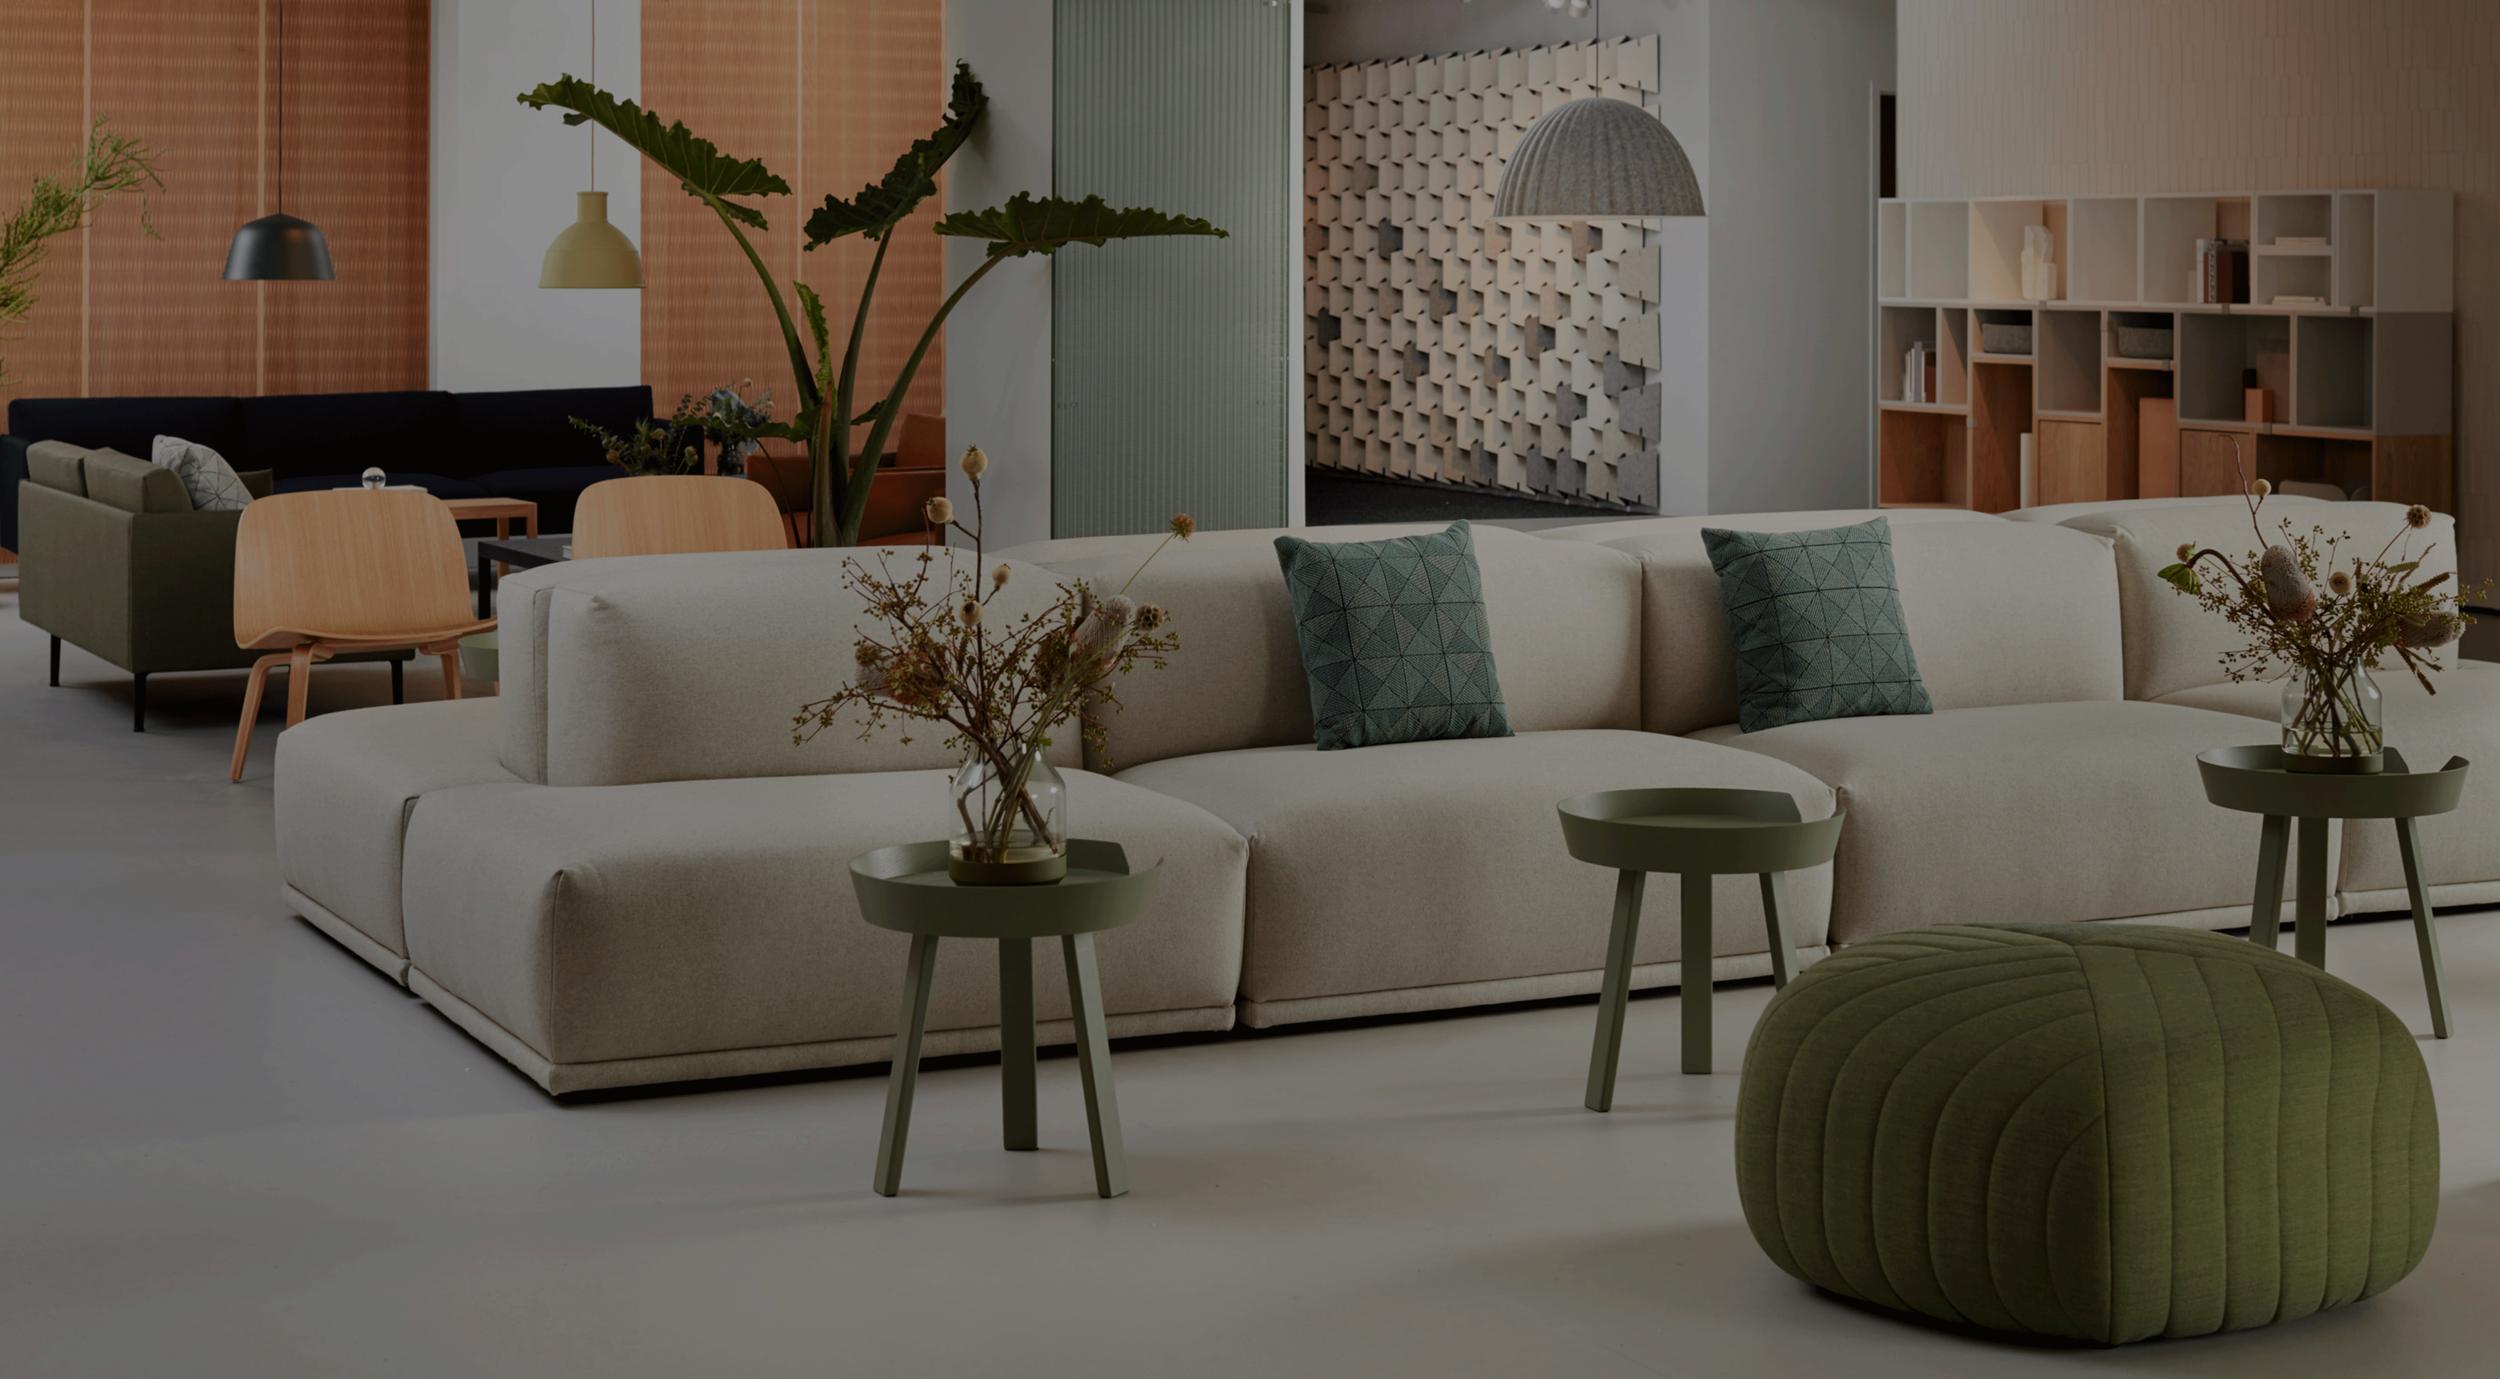 MUUTO   A New Perspective of Scandinavian Design   visit their website